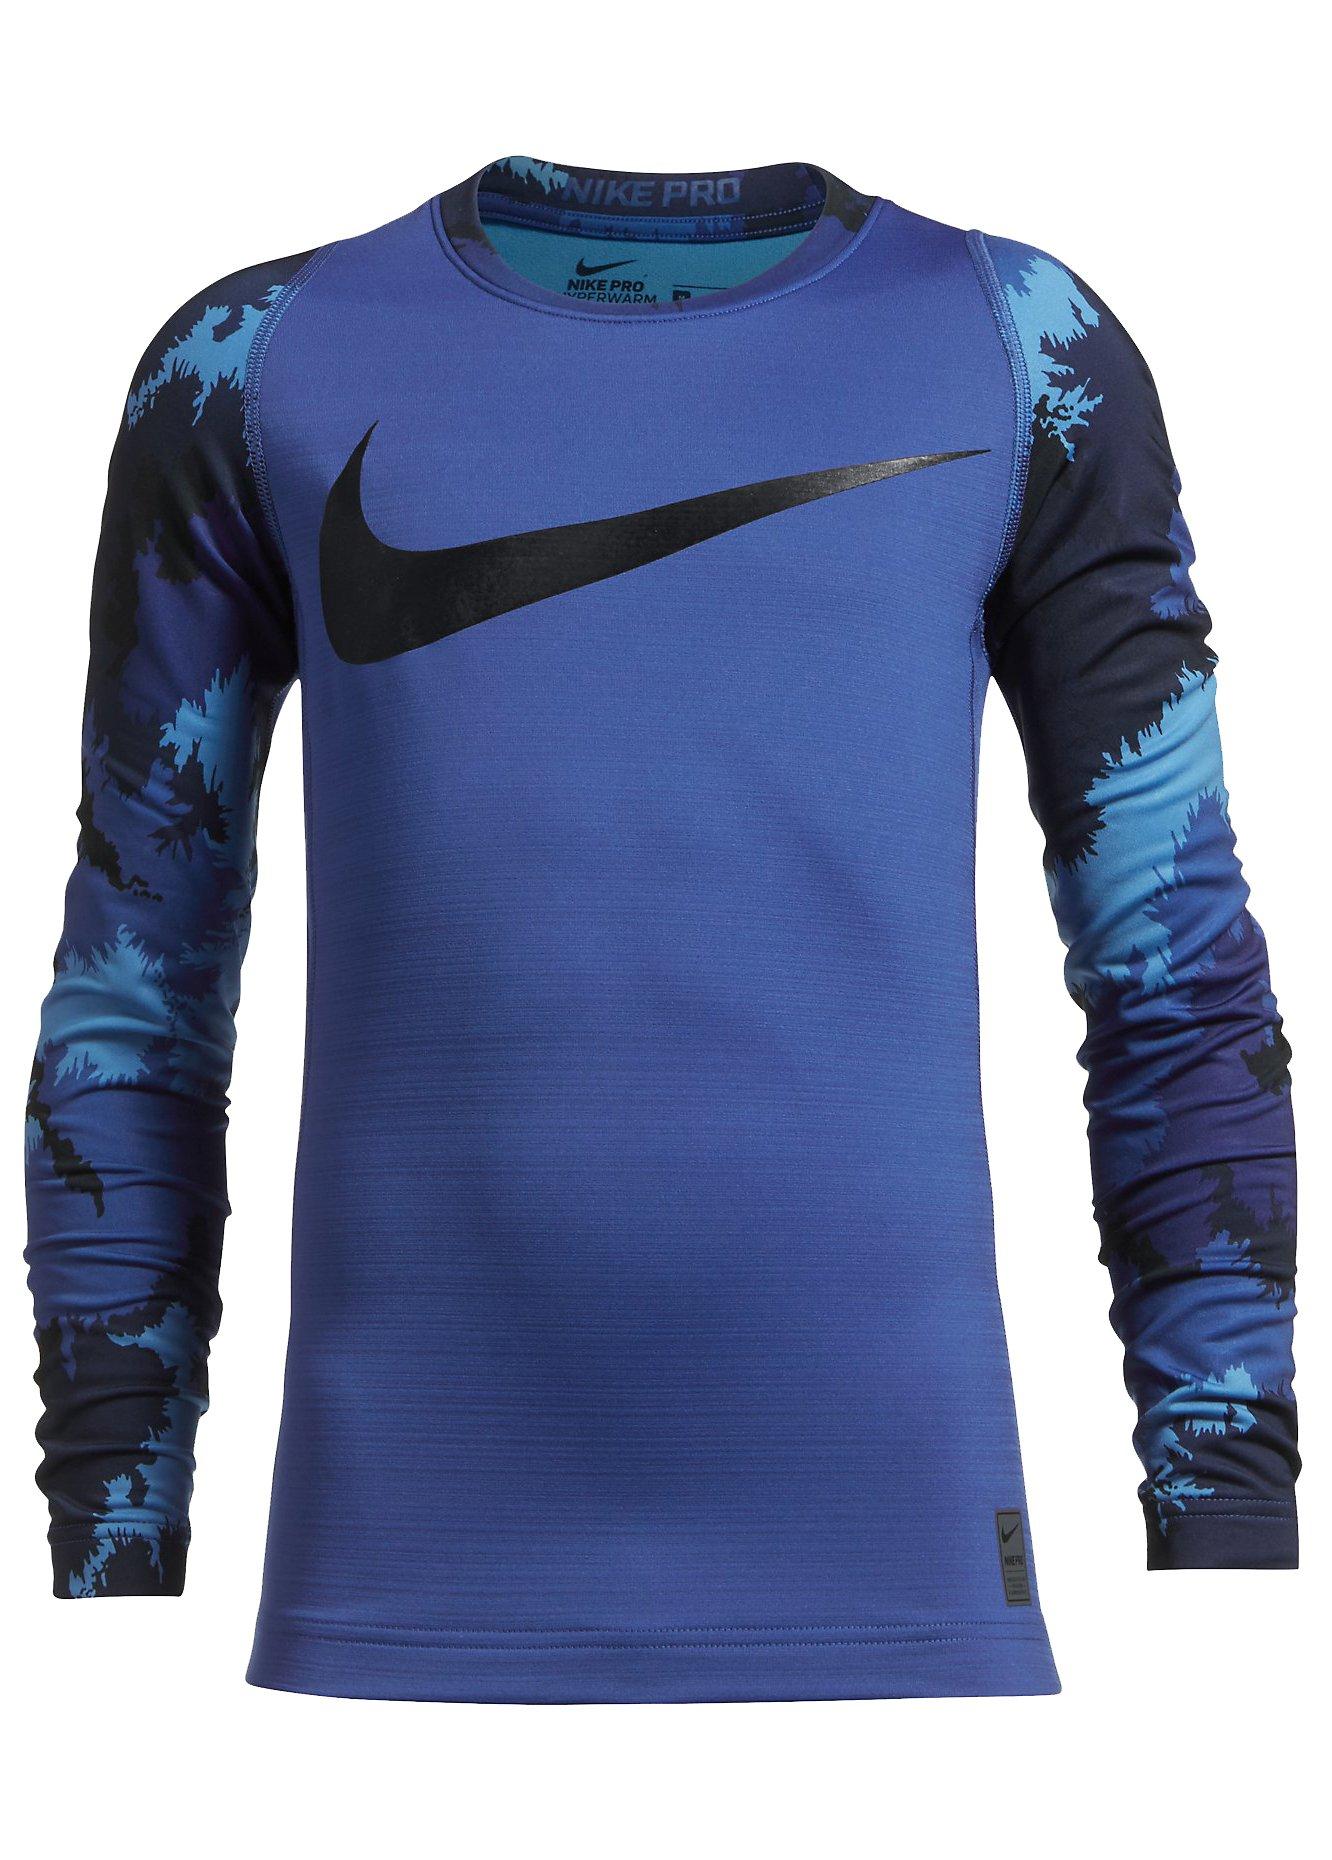 Tričko s dlhým rukávom Nike B NP HPRWM TOP LS AOP CREW